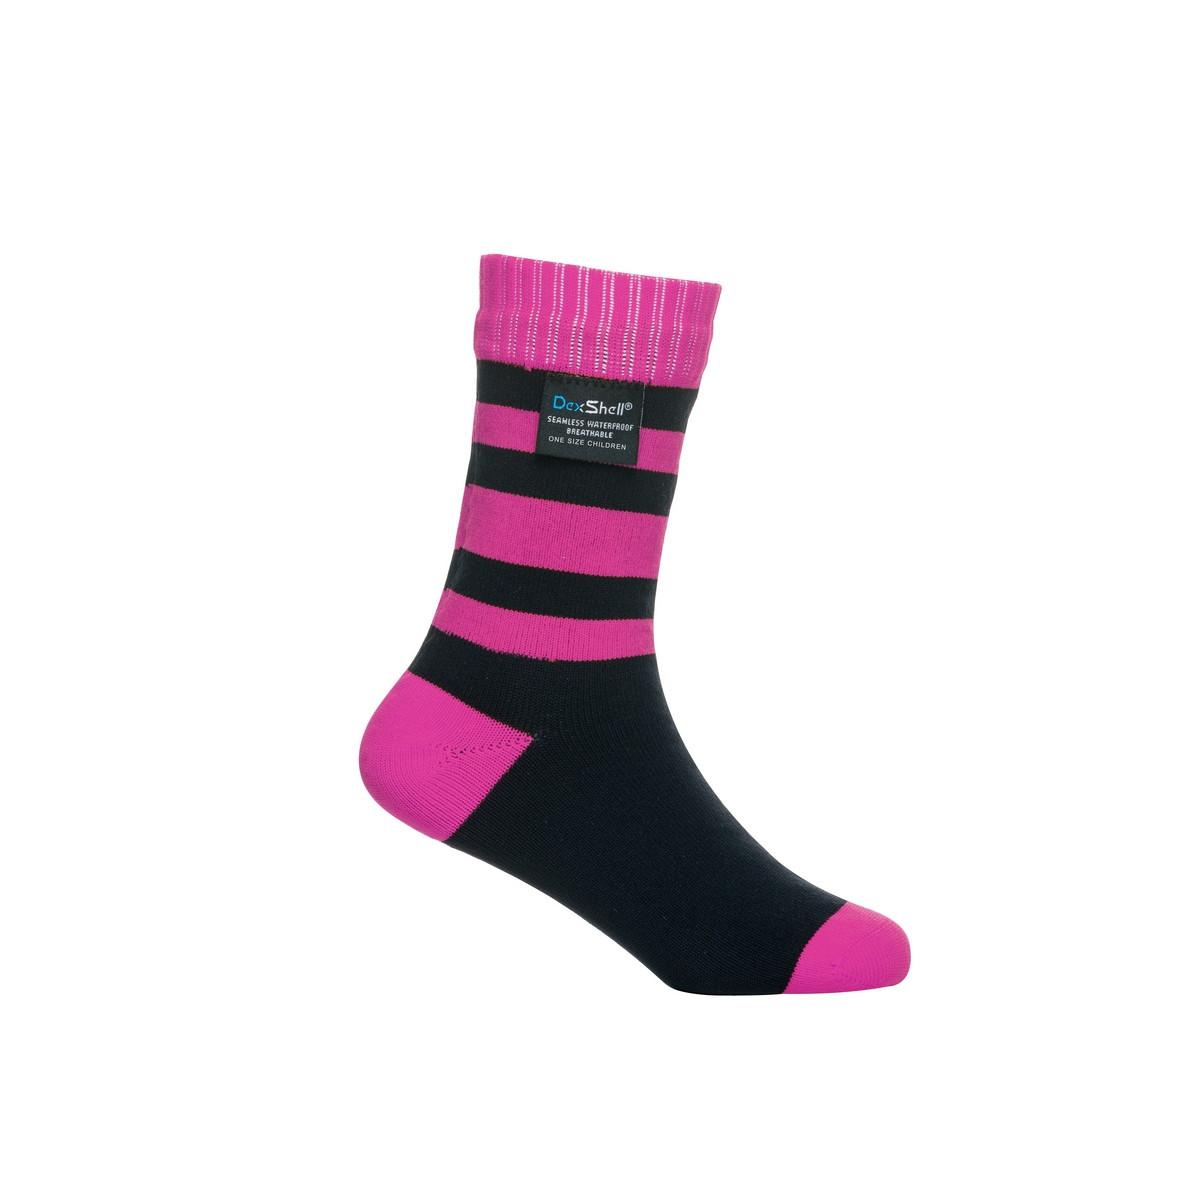 Носки водонепроницаемые Dexshell Children soсks pink S  детские розовые